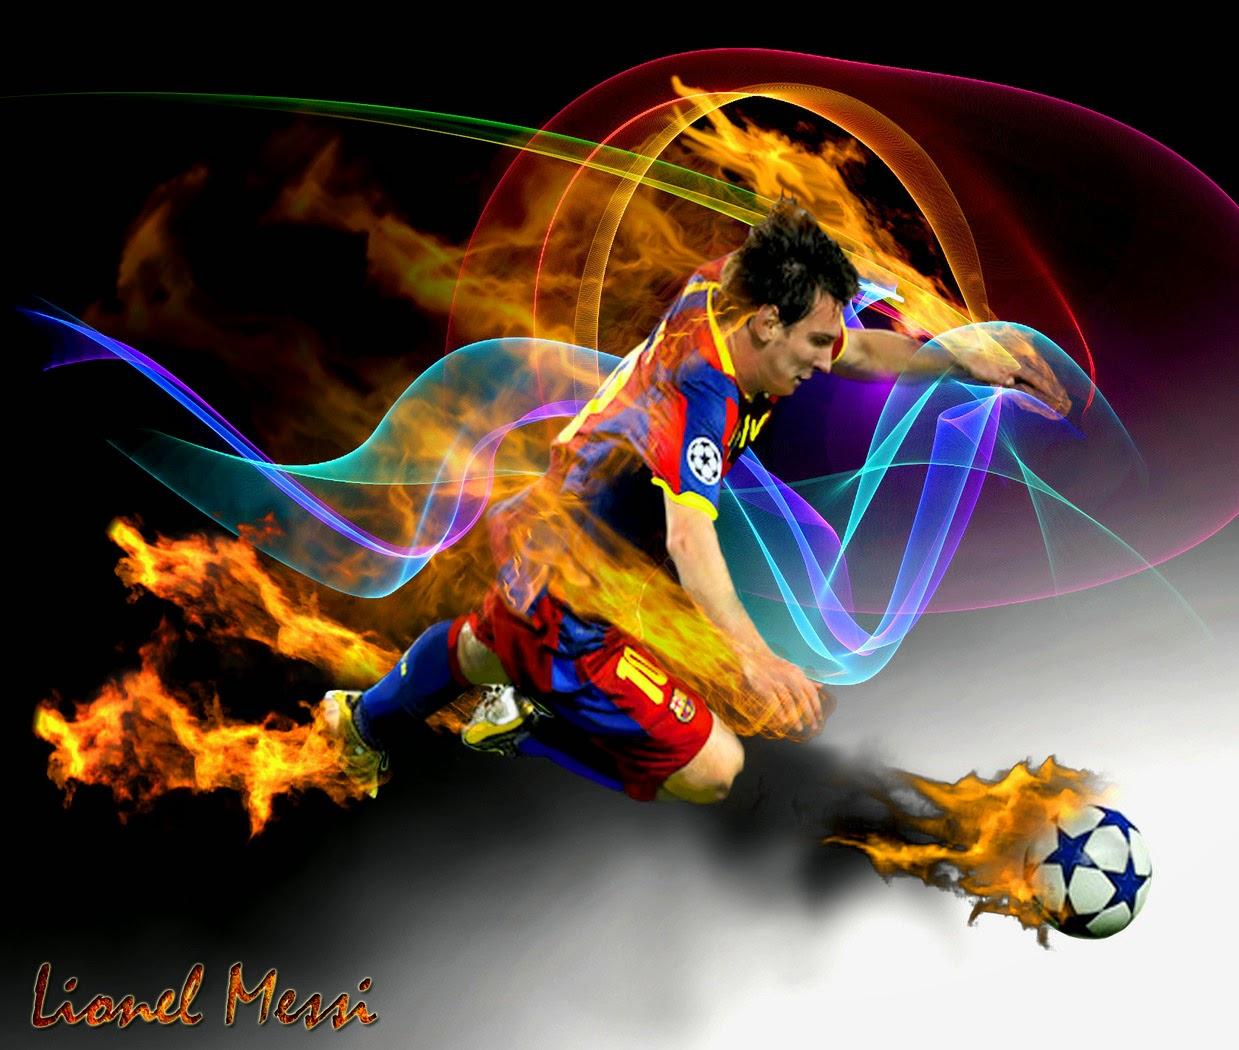 Gambar Kartun Lucu Pemain Bola Dunia Gambar Meme